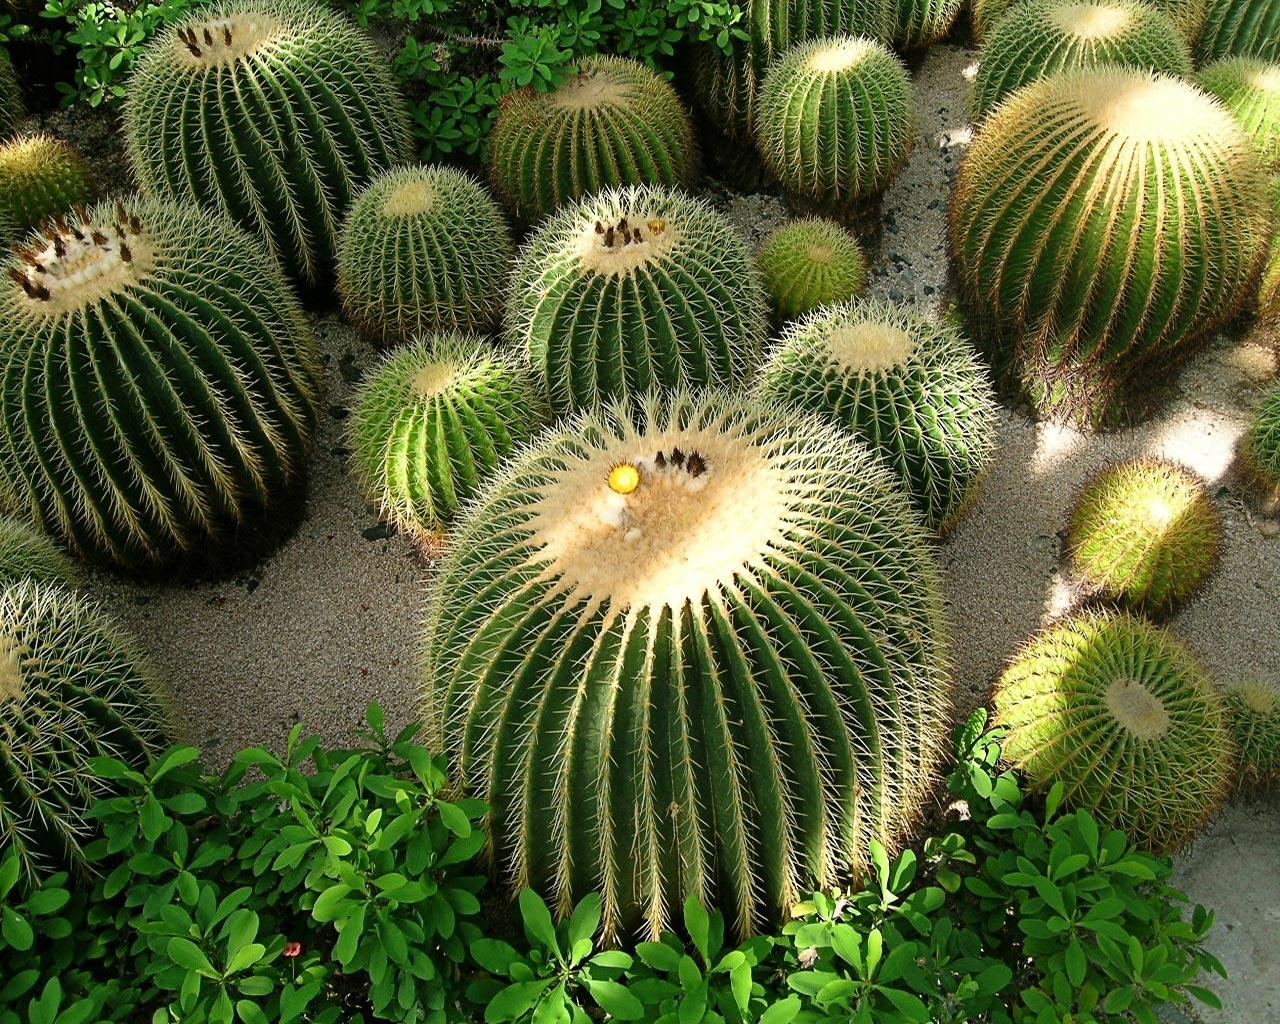 http://2.bp.blogspot.com/-T24zL3UU_aU/TmnKJHx6lZI/AAAAAAAAEmE/ioS6iltIn8c/s1600/Cactus%2B2.jpg